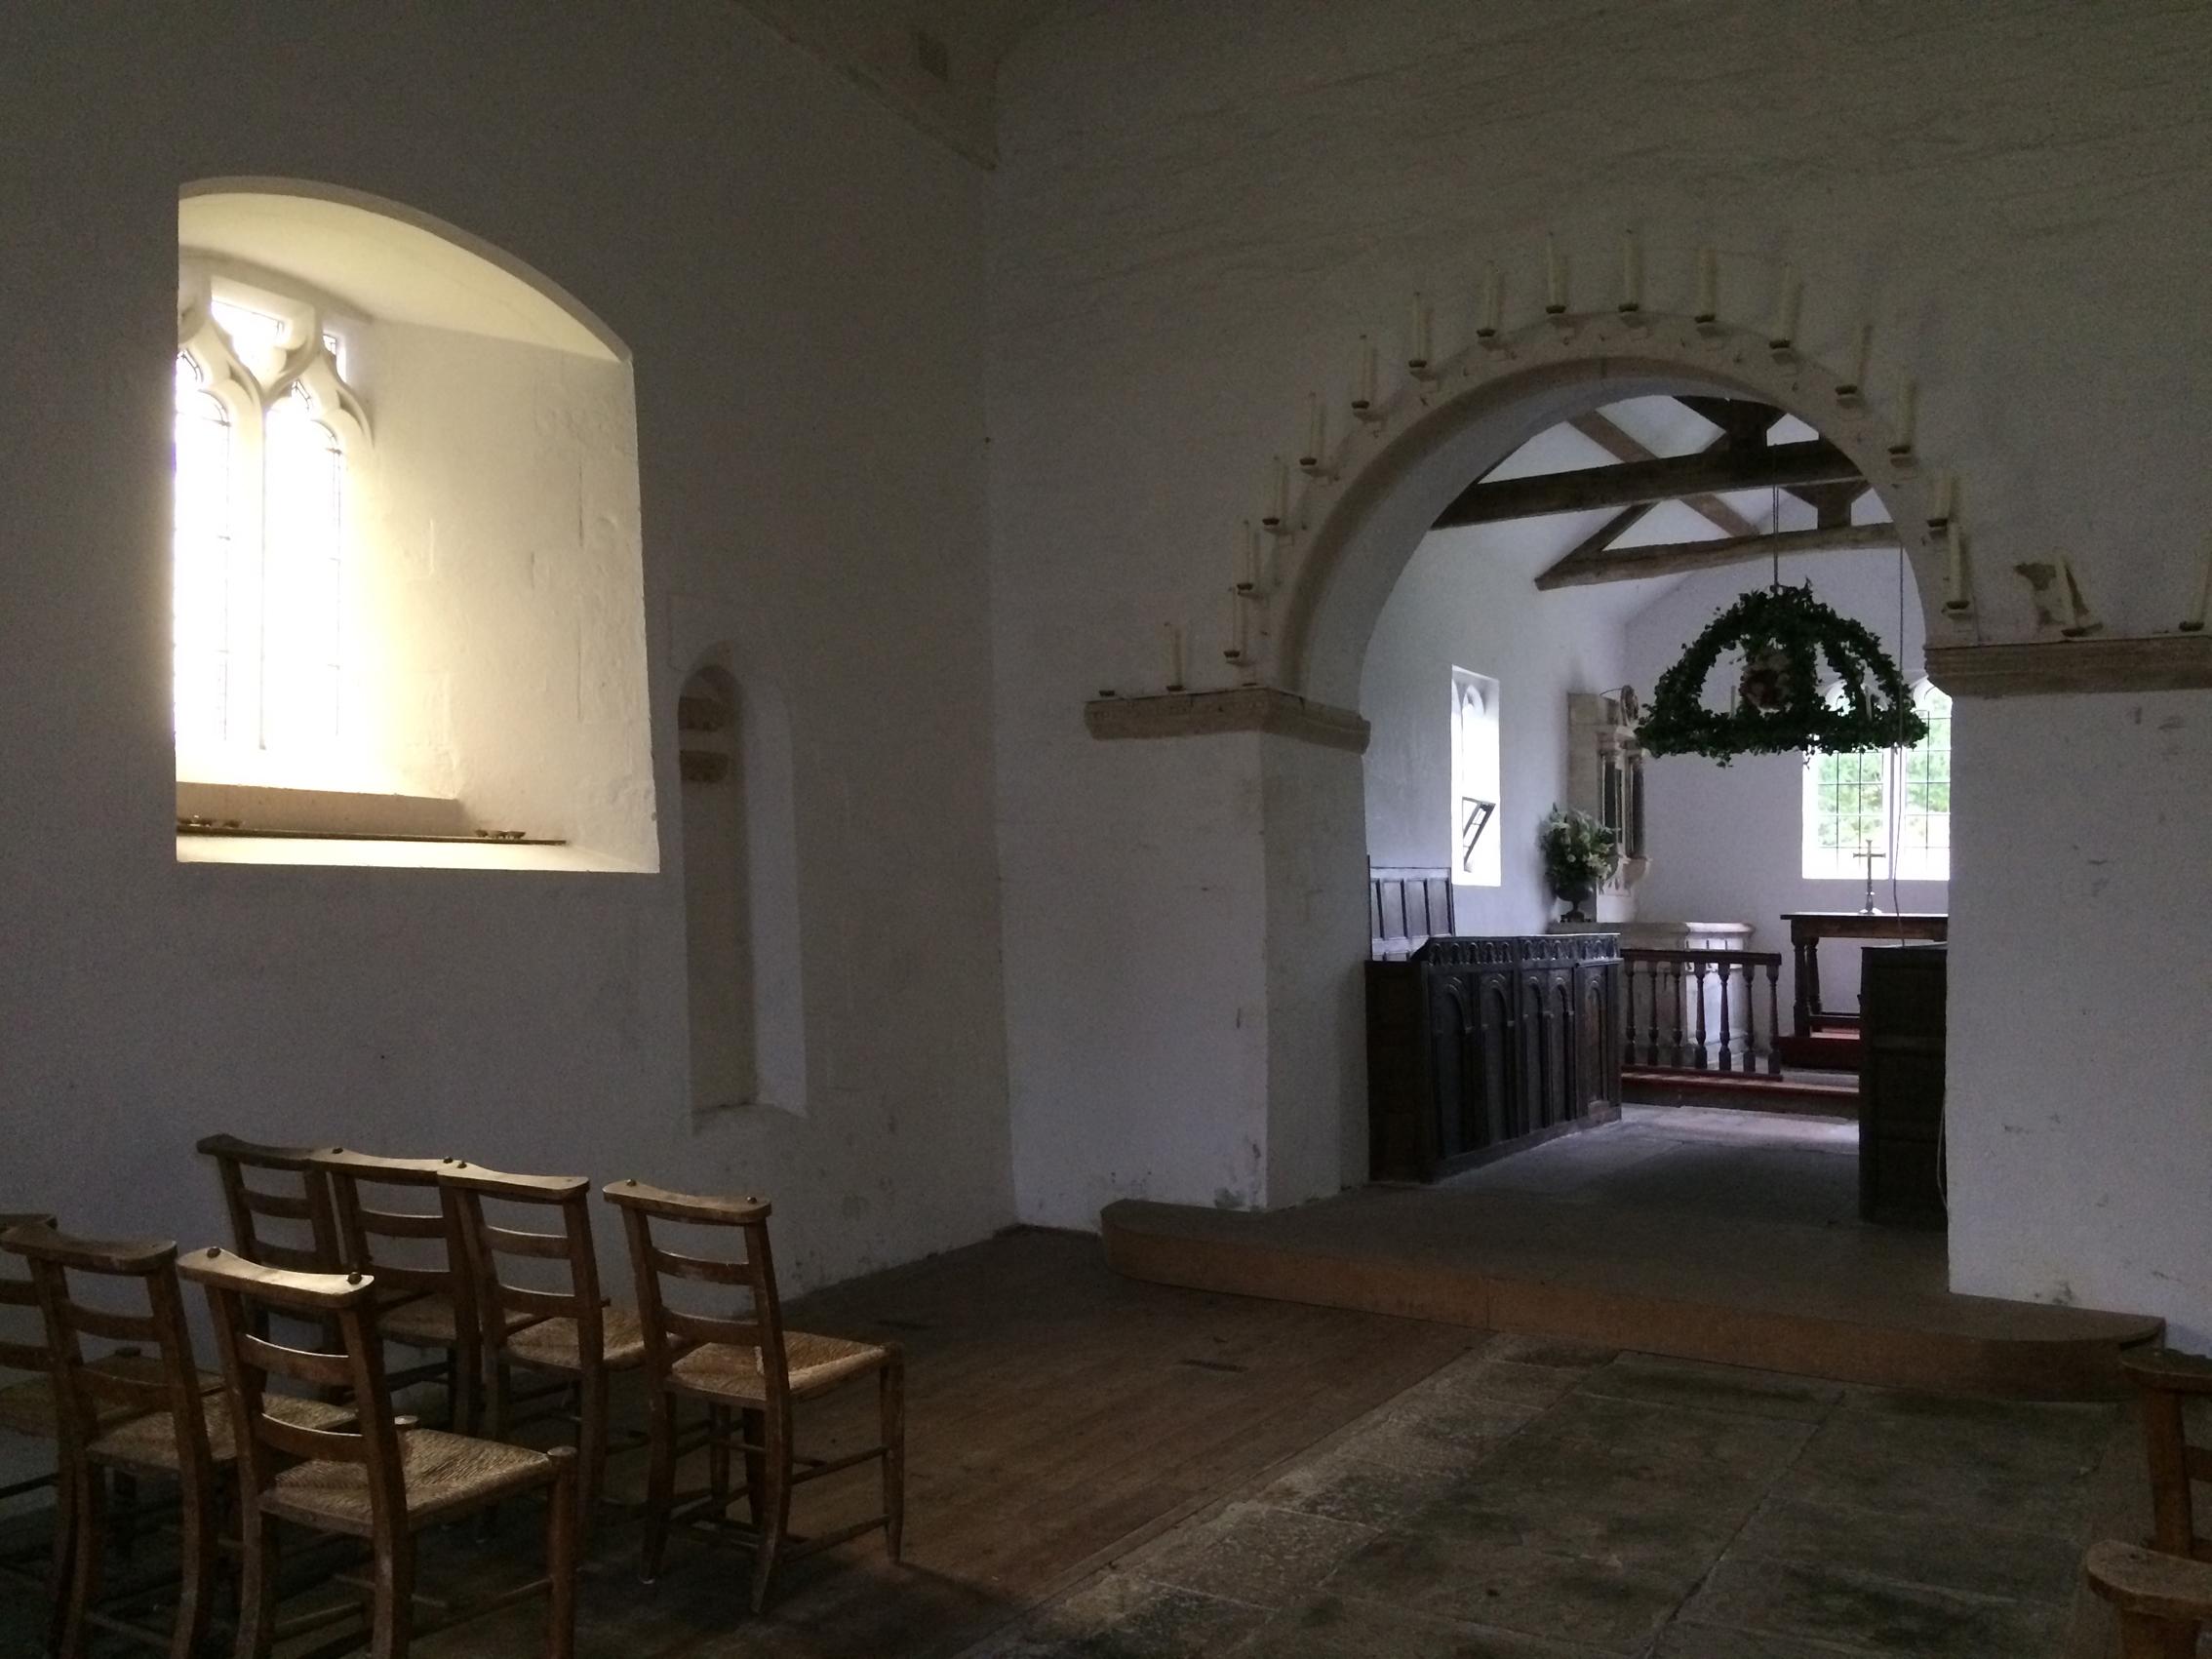 All saints, Alton Priors, Wiltshire